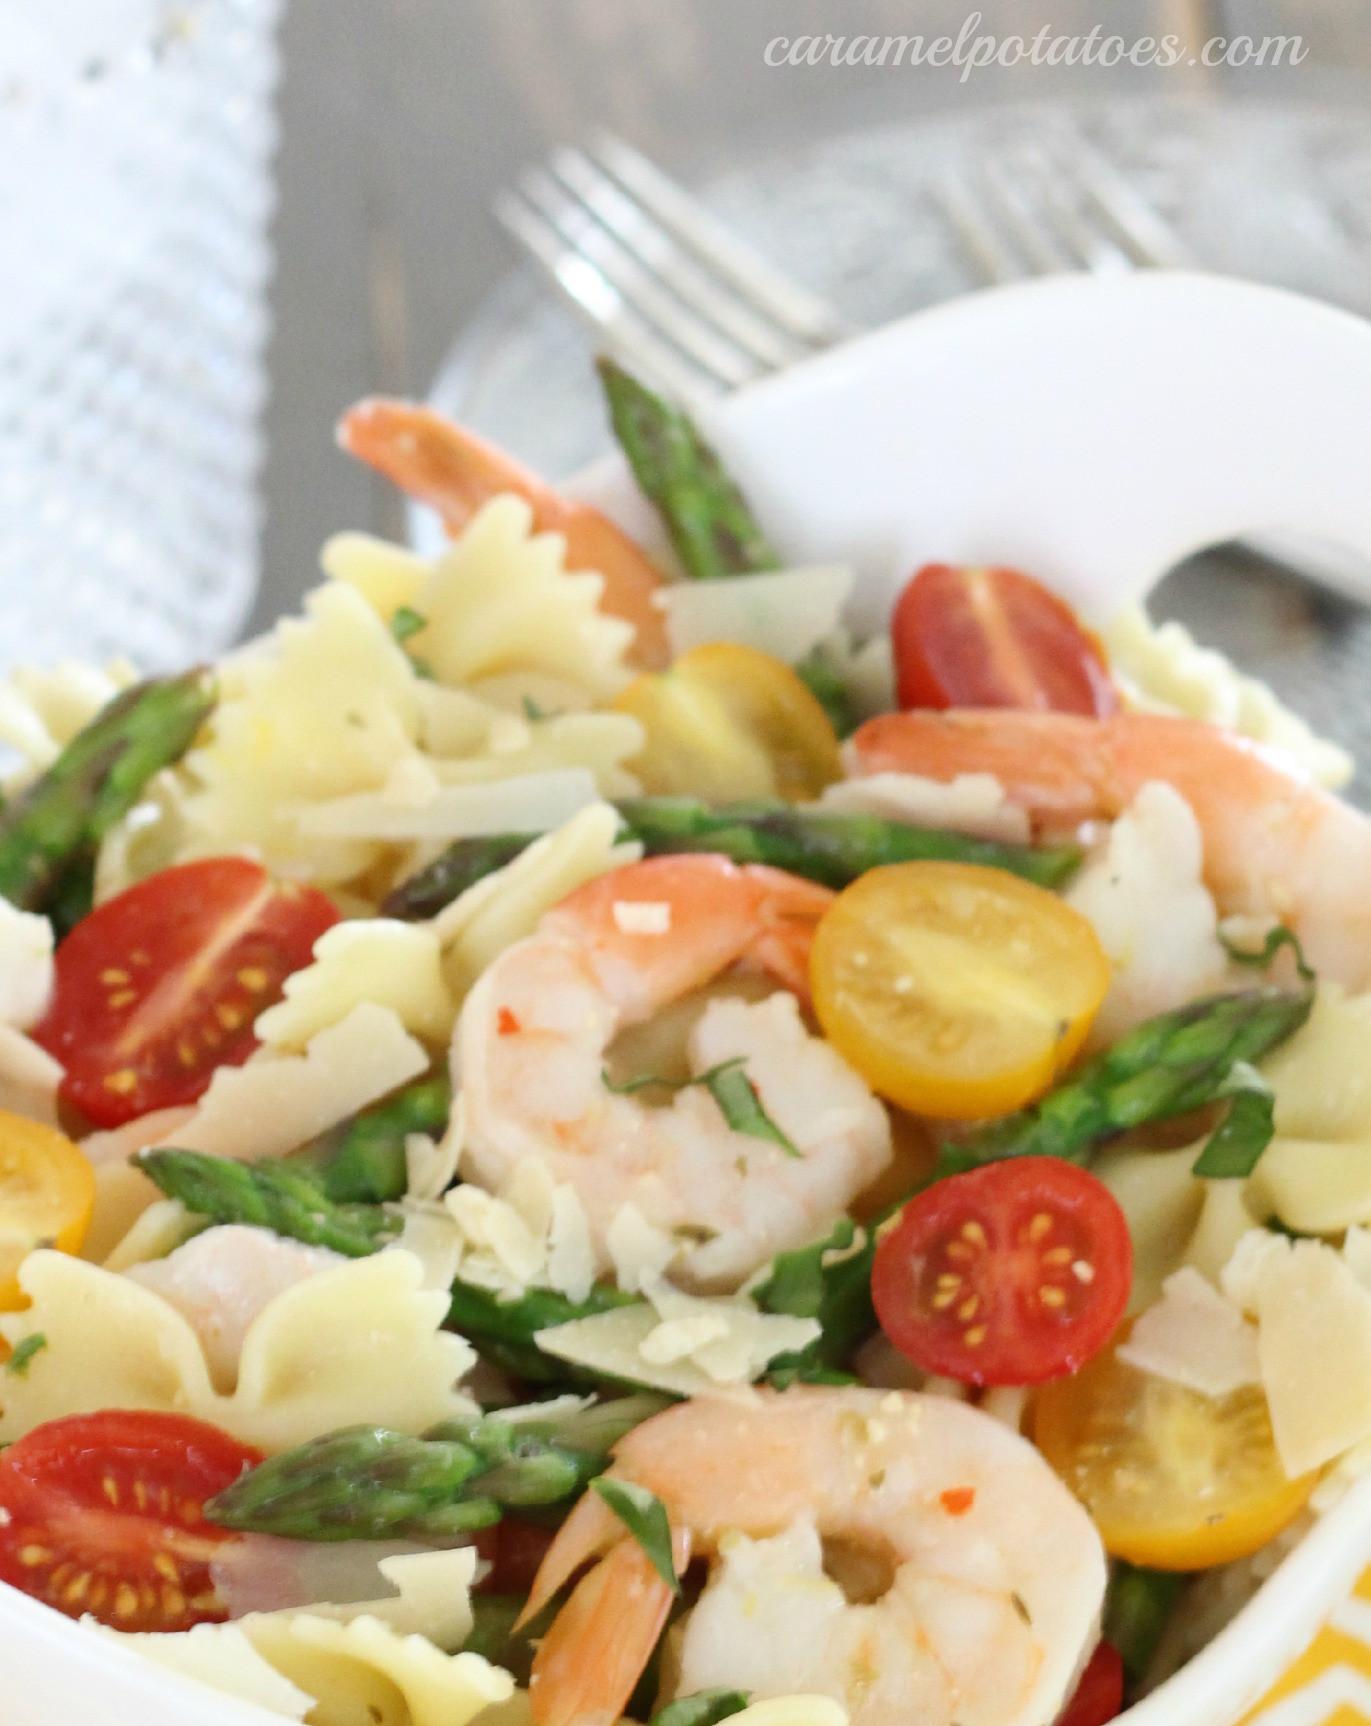 Shrimp And Pasta Salad  Caramel Potatoes Search Results Shrimp pasta salad